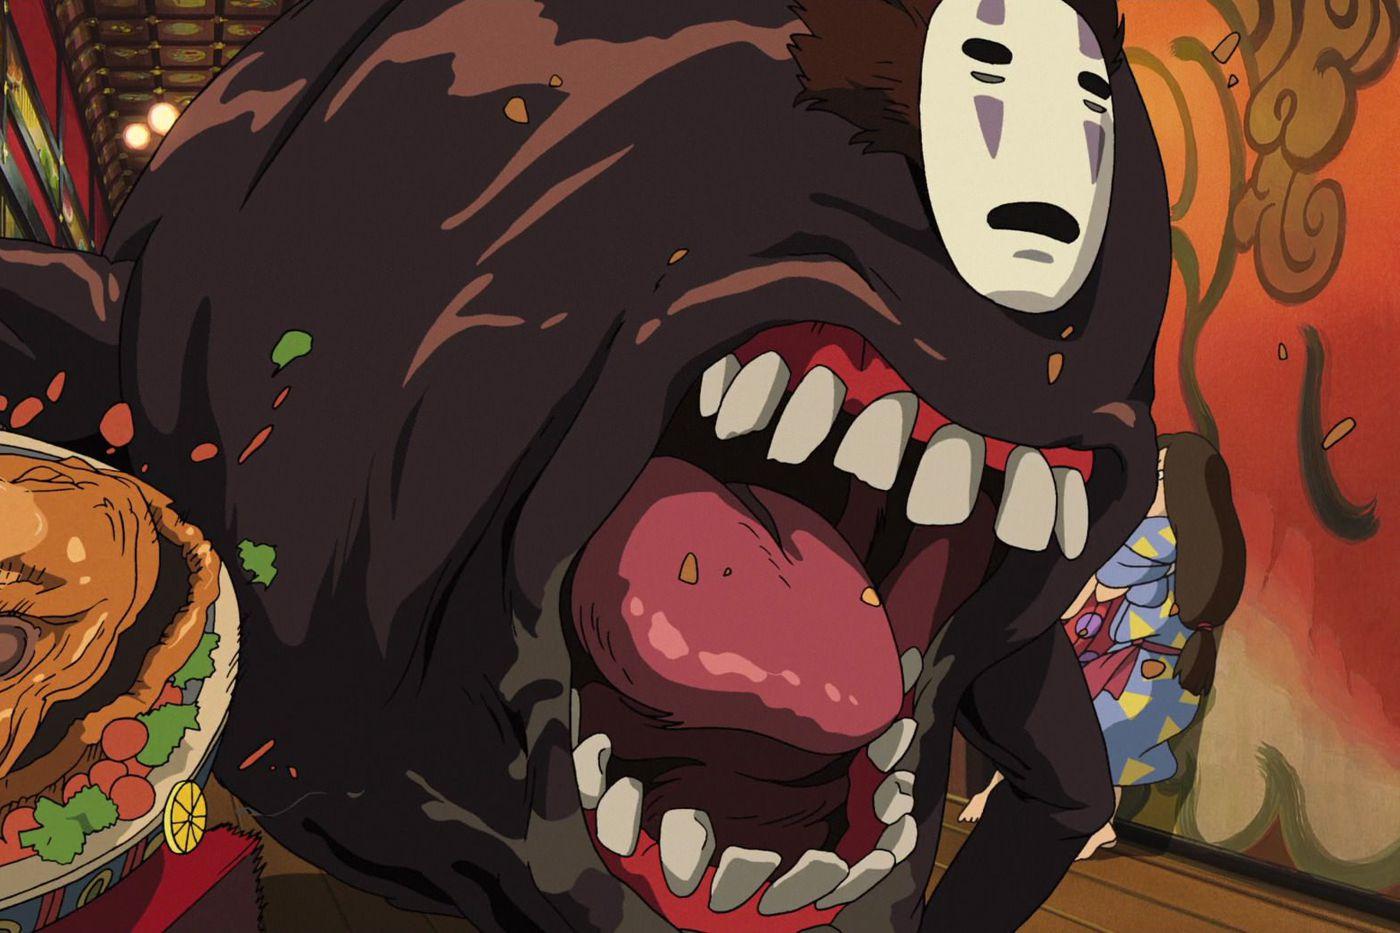 How To Watch Studio Ghibli Movies On Hbo Max Netflix Hulu And Beyond Polygon